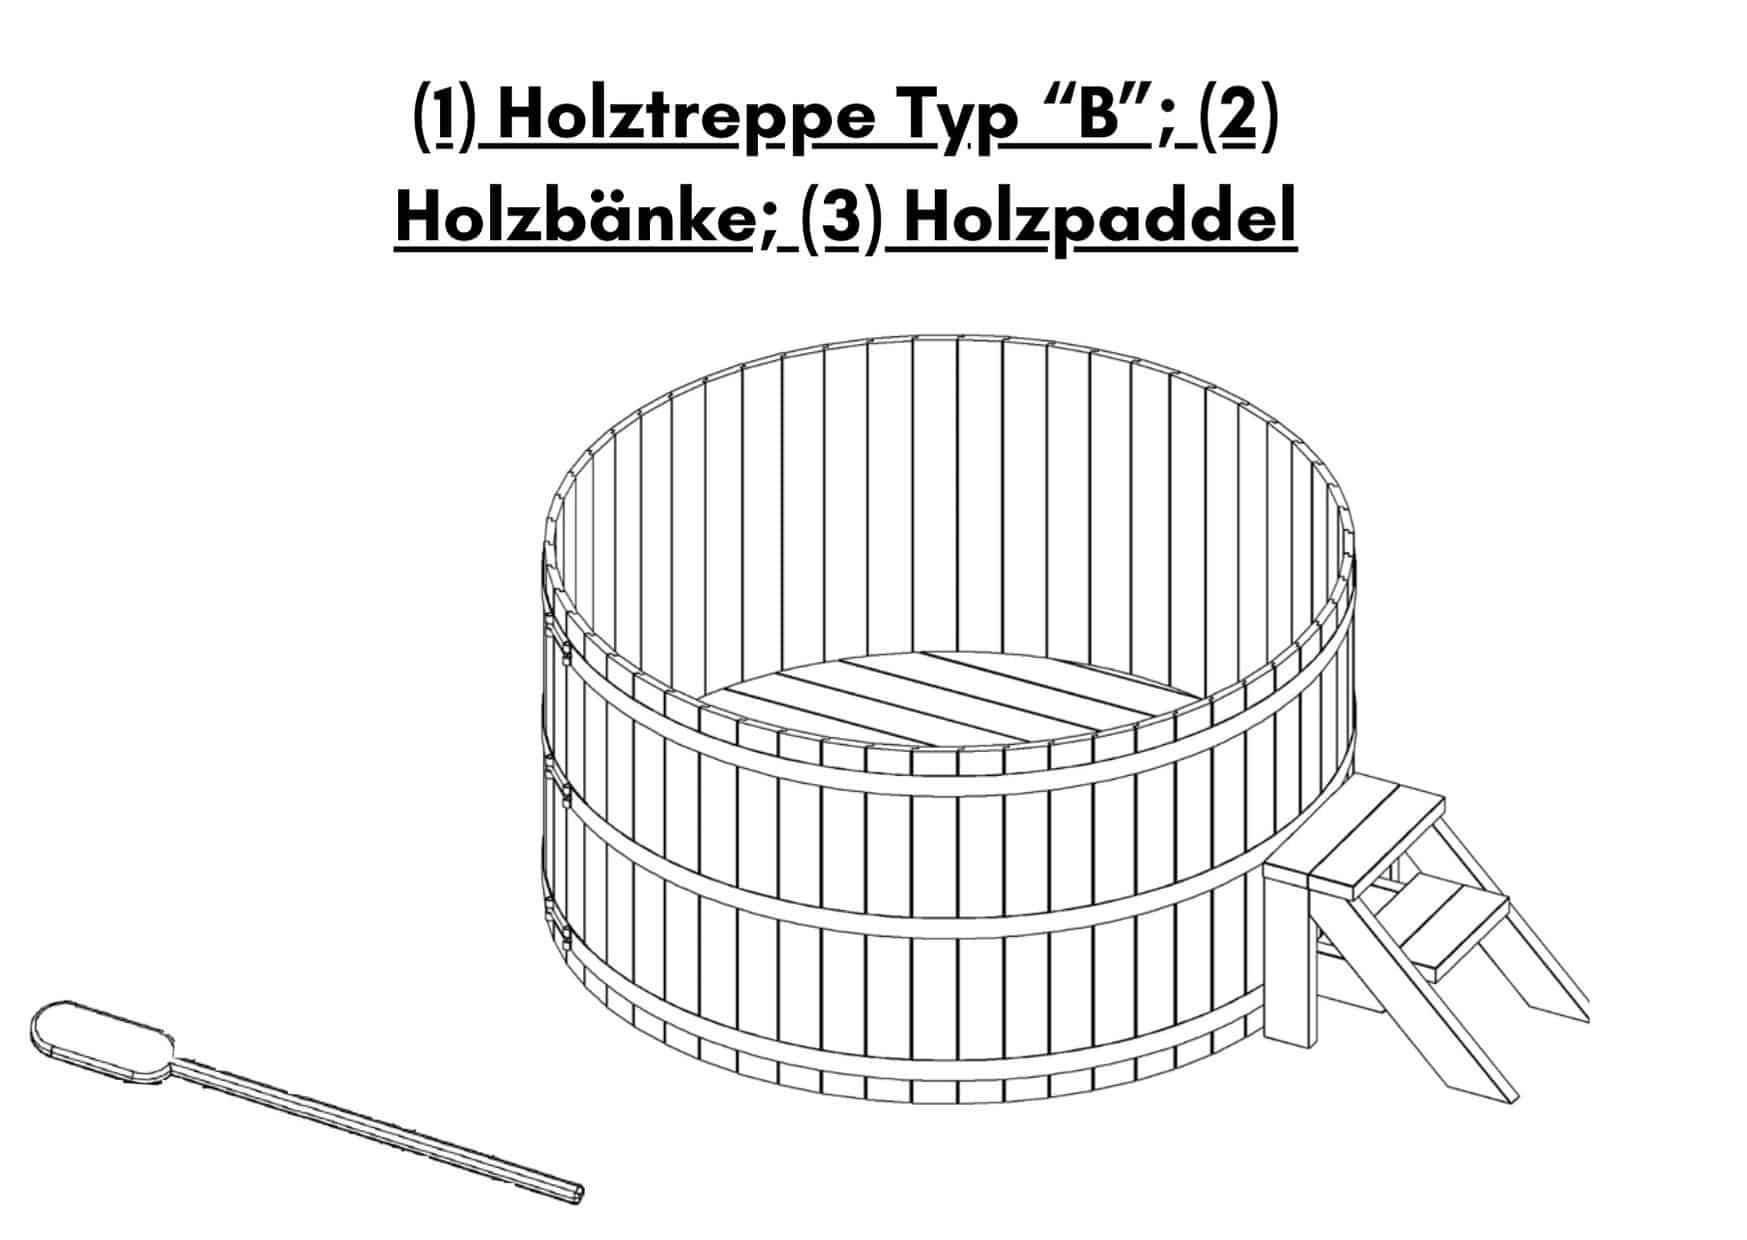 1 Holztreppe Typ B 2 Holzbaenke 3 Holzpaddel